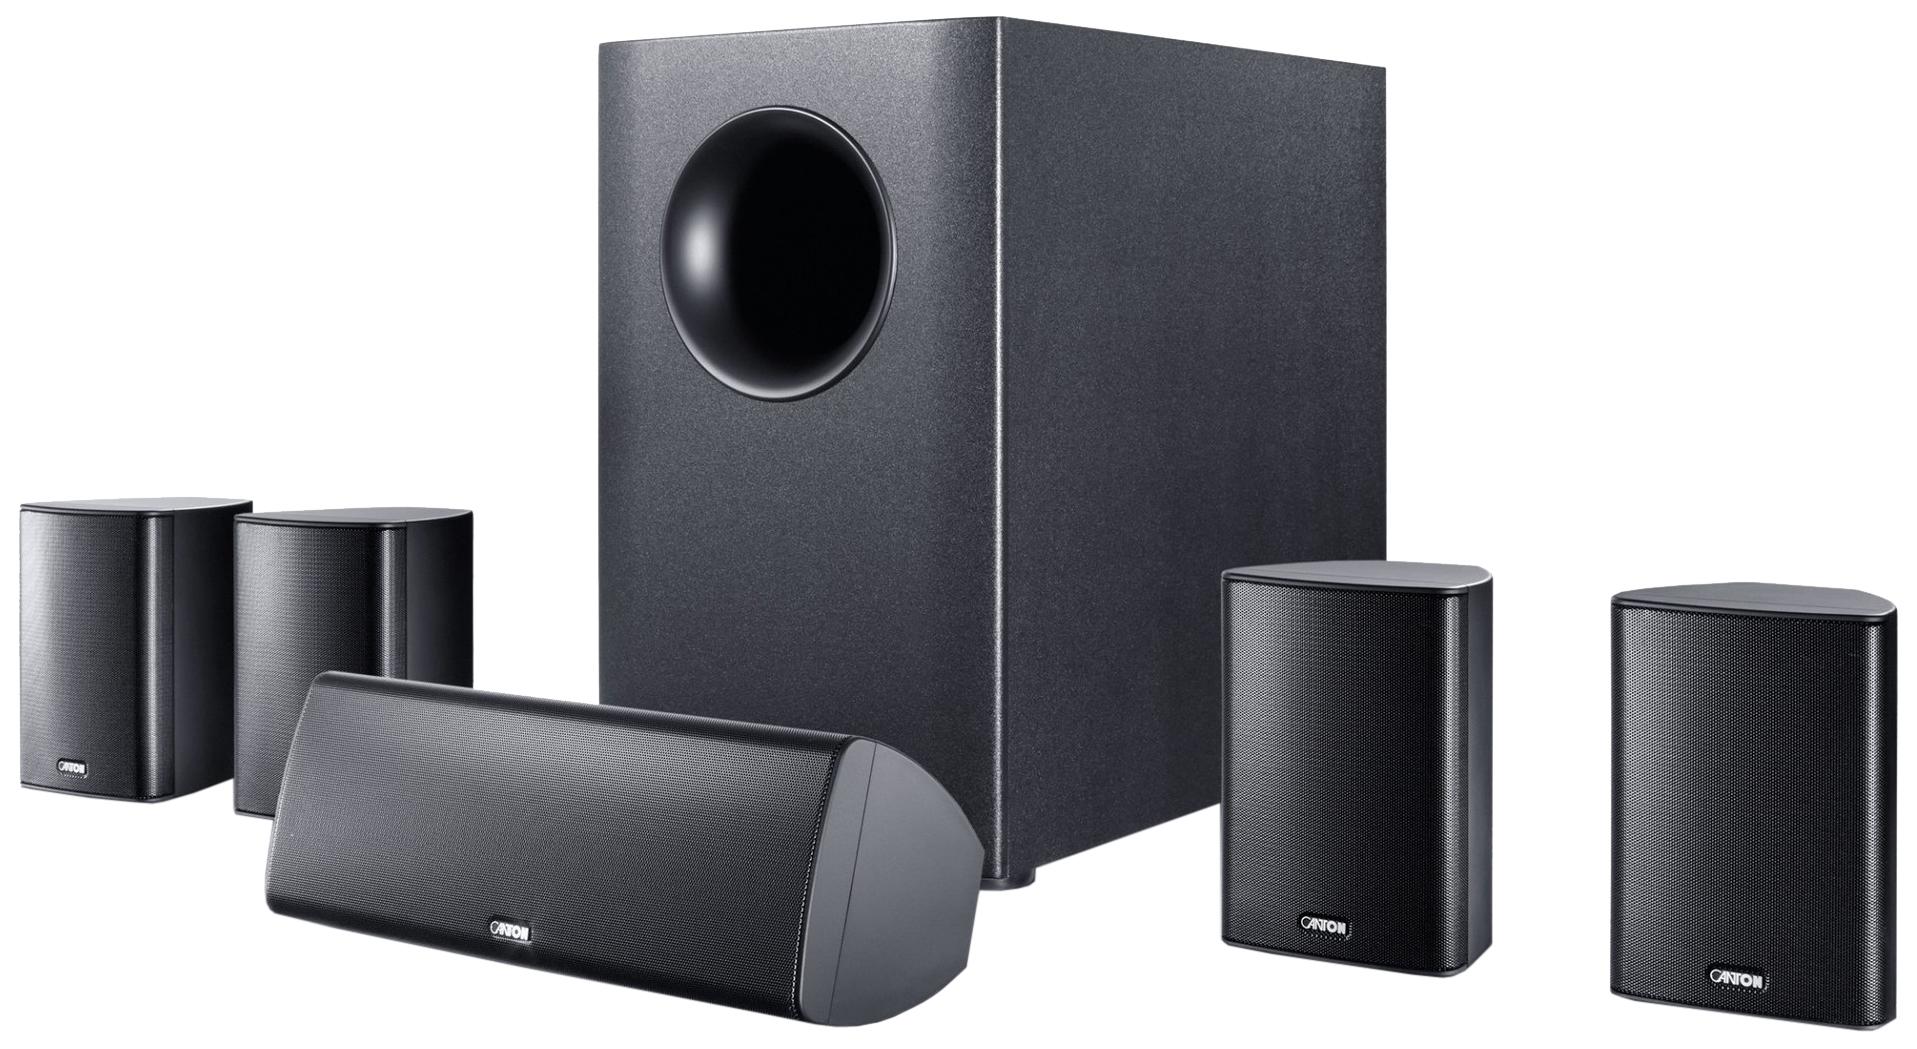 Комплект акустической системы Canton Movie 165 Вlack Movie 165 black